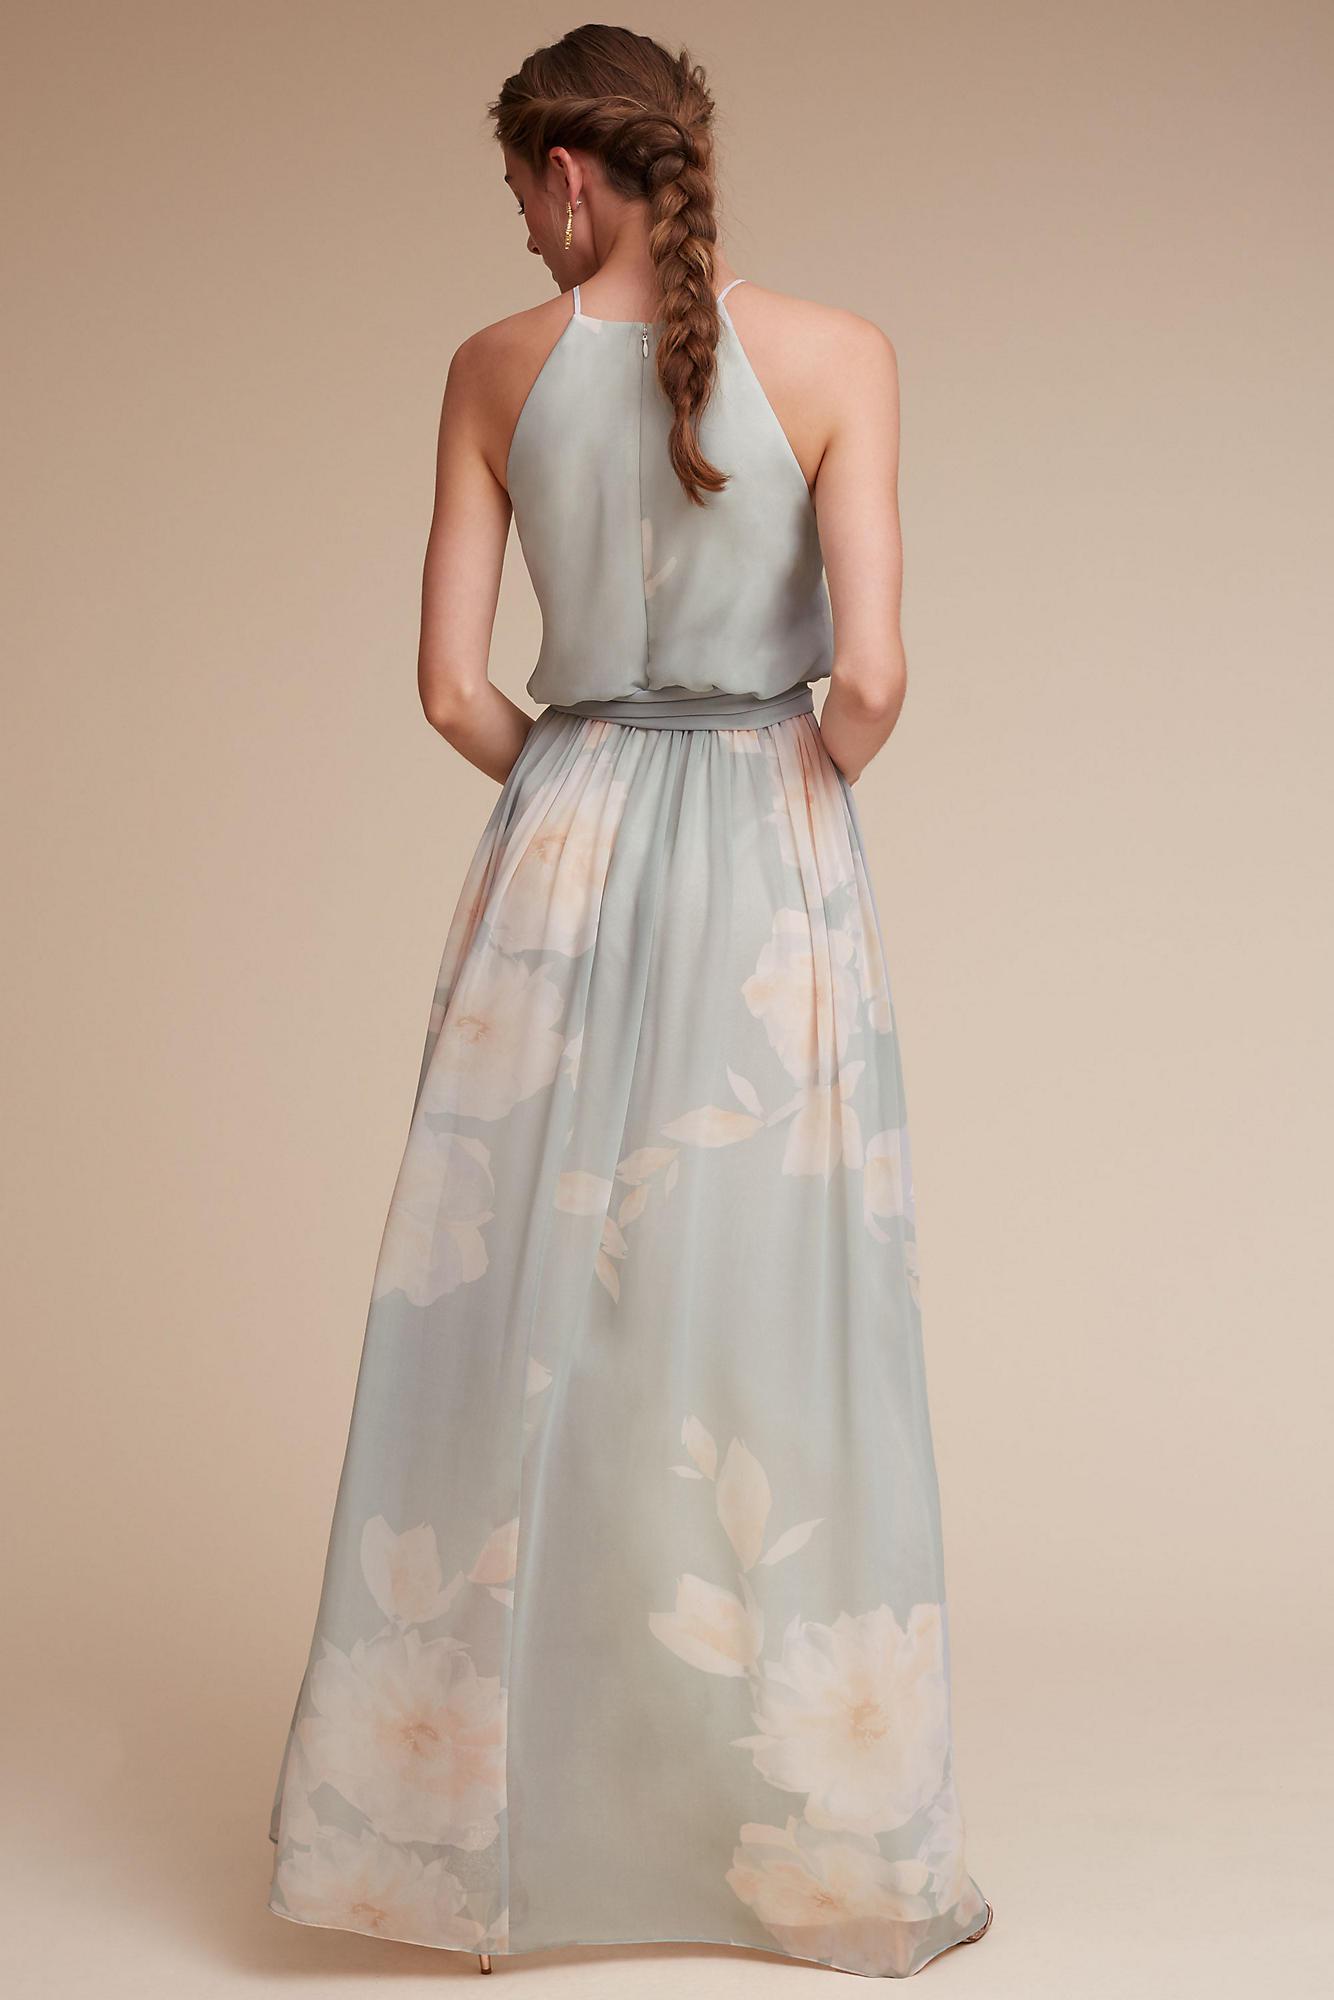 42ecefd88196d Gallery. Women's Chiffon Dresses